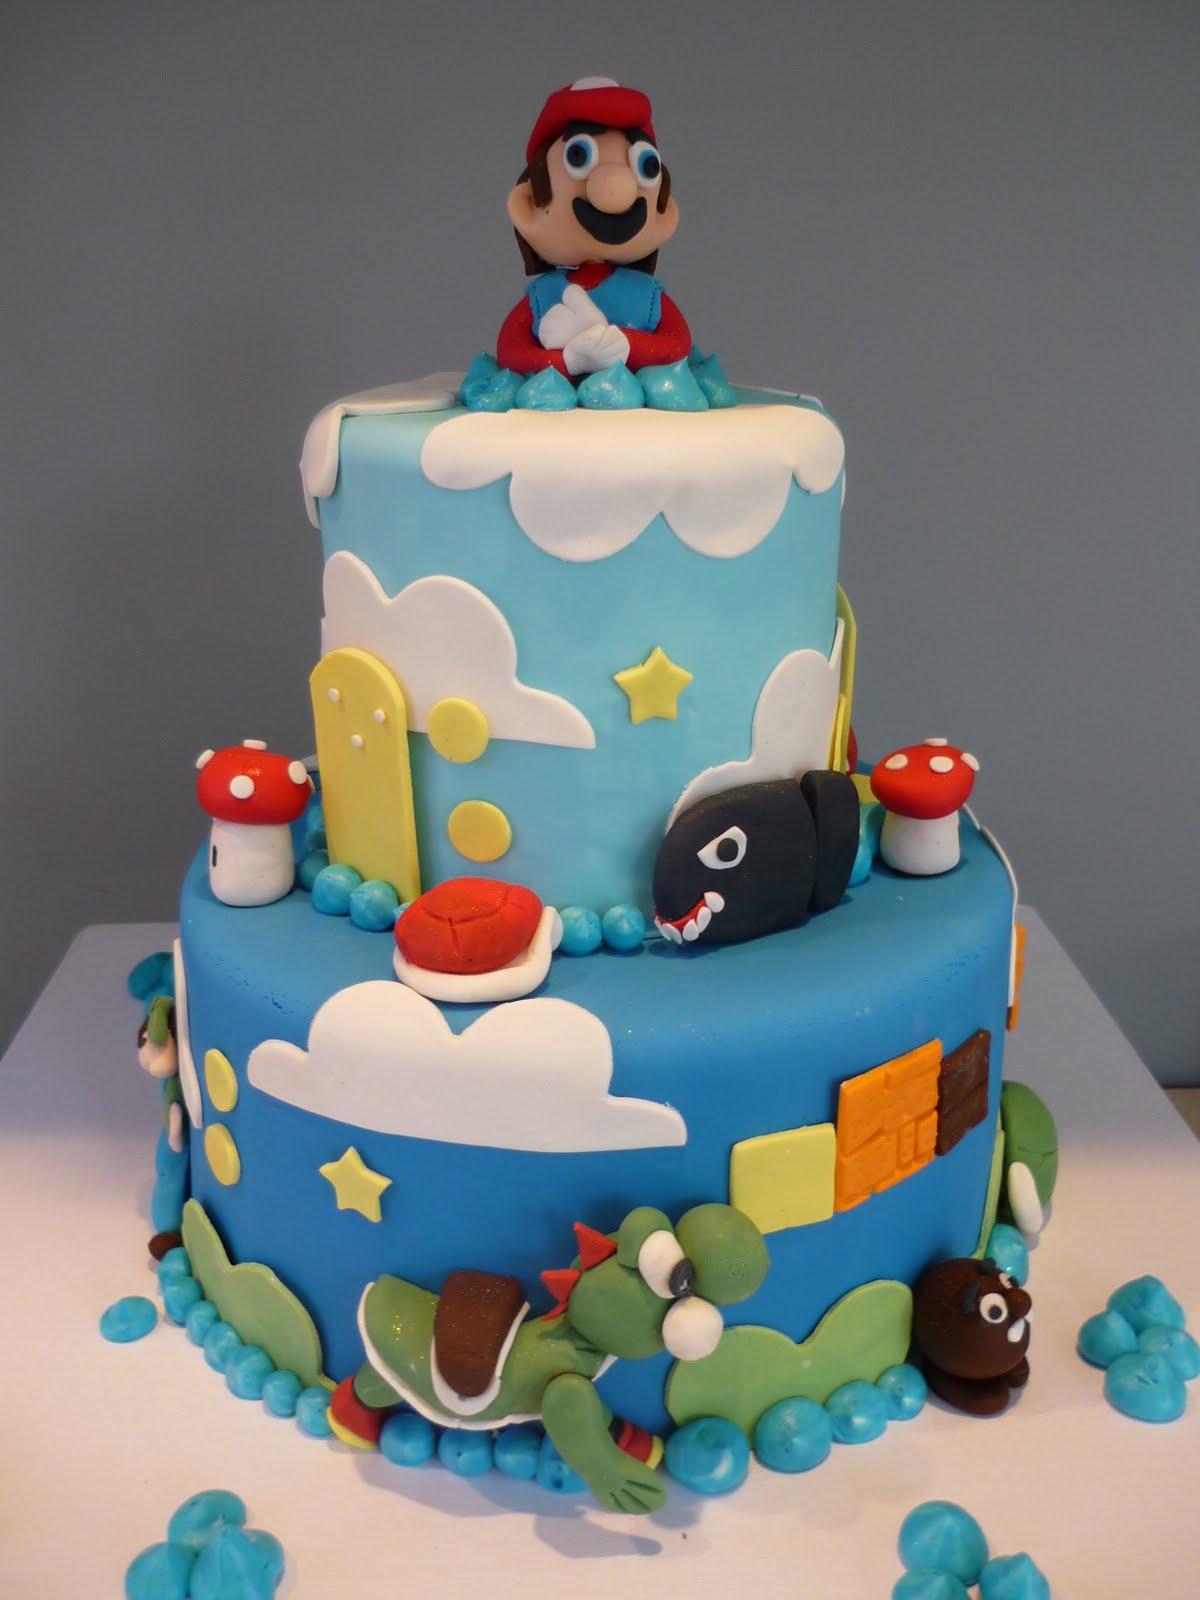 Artisan Bake Shop Super Duber Super Mario Video Game Cake